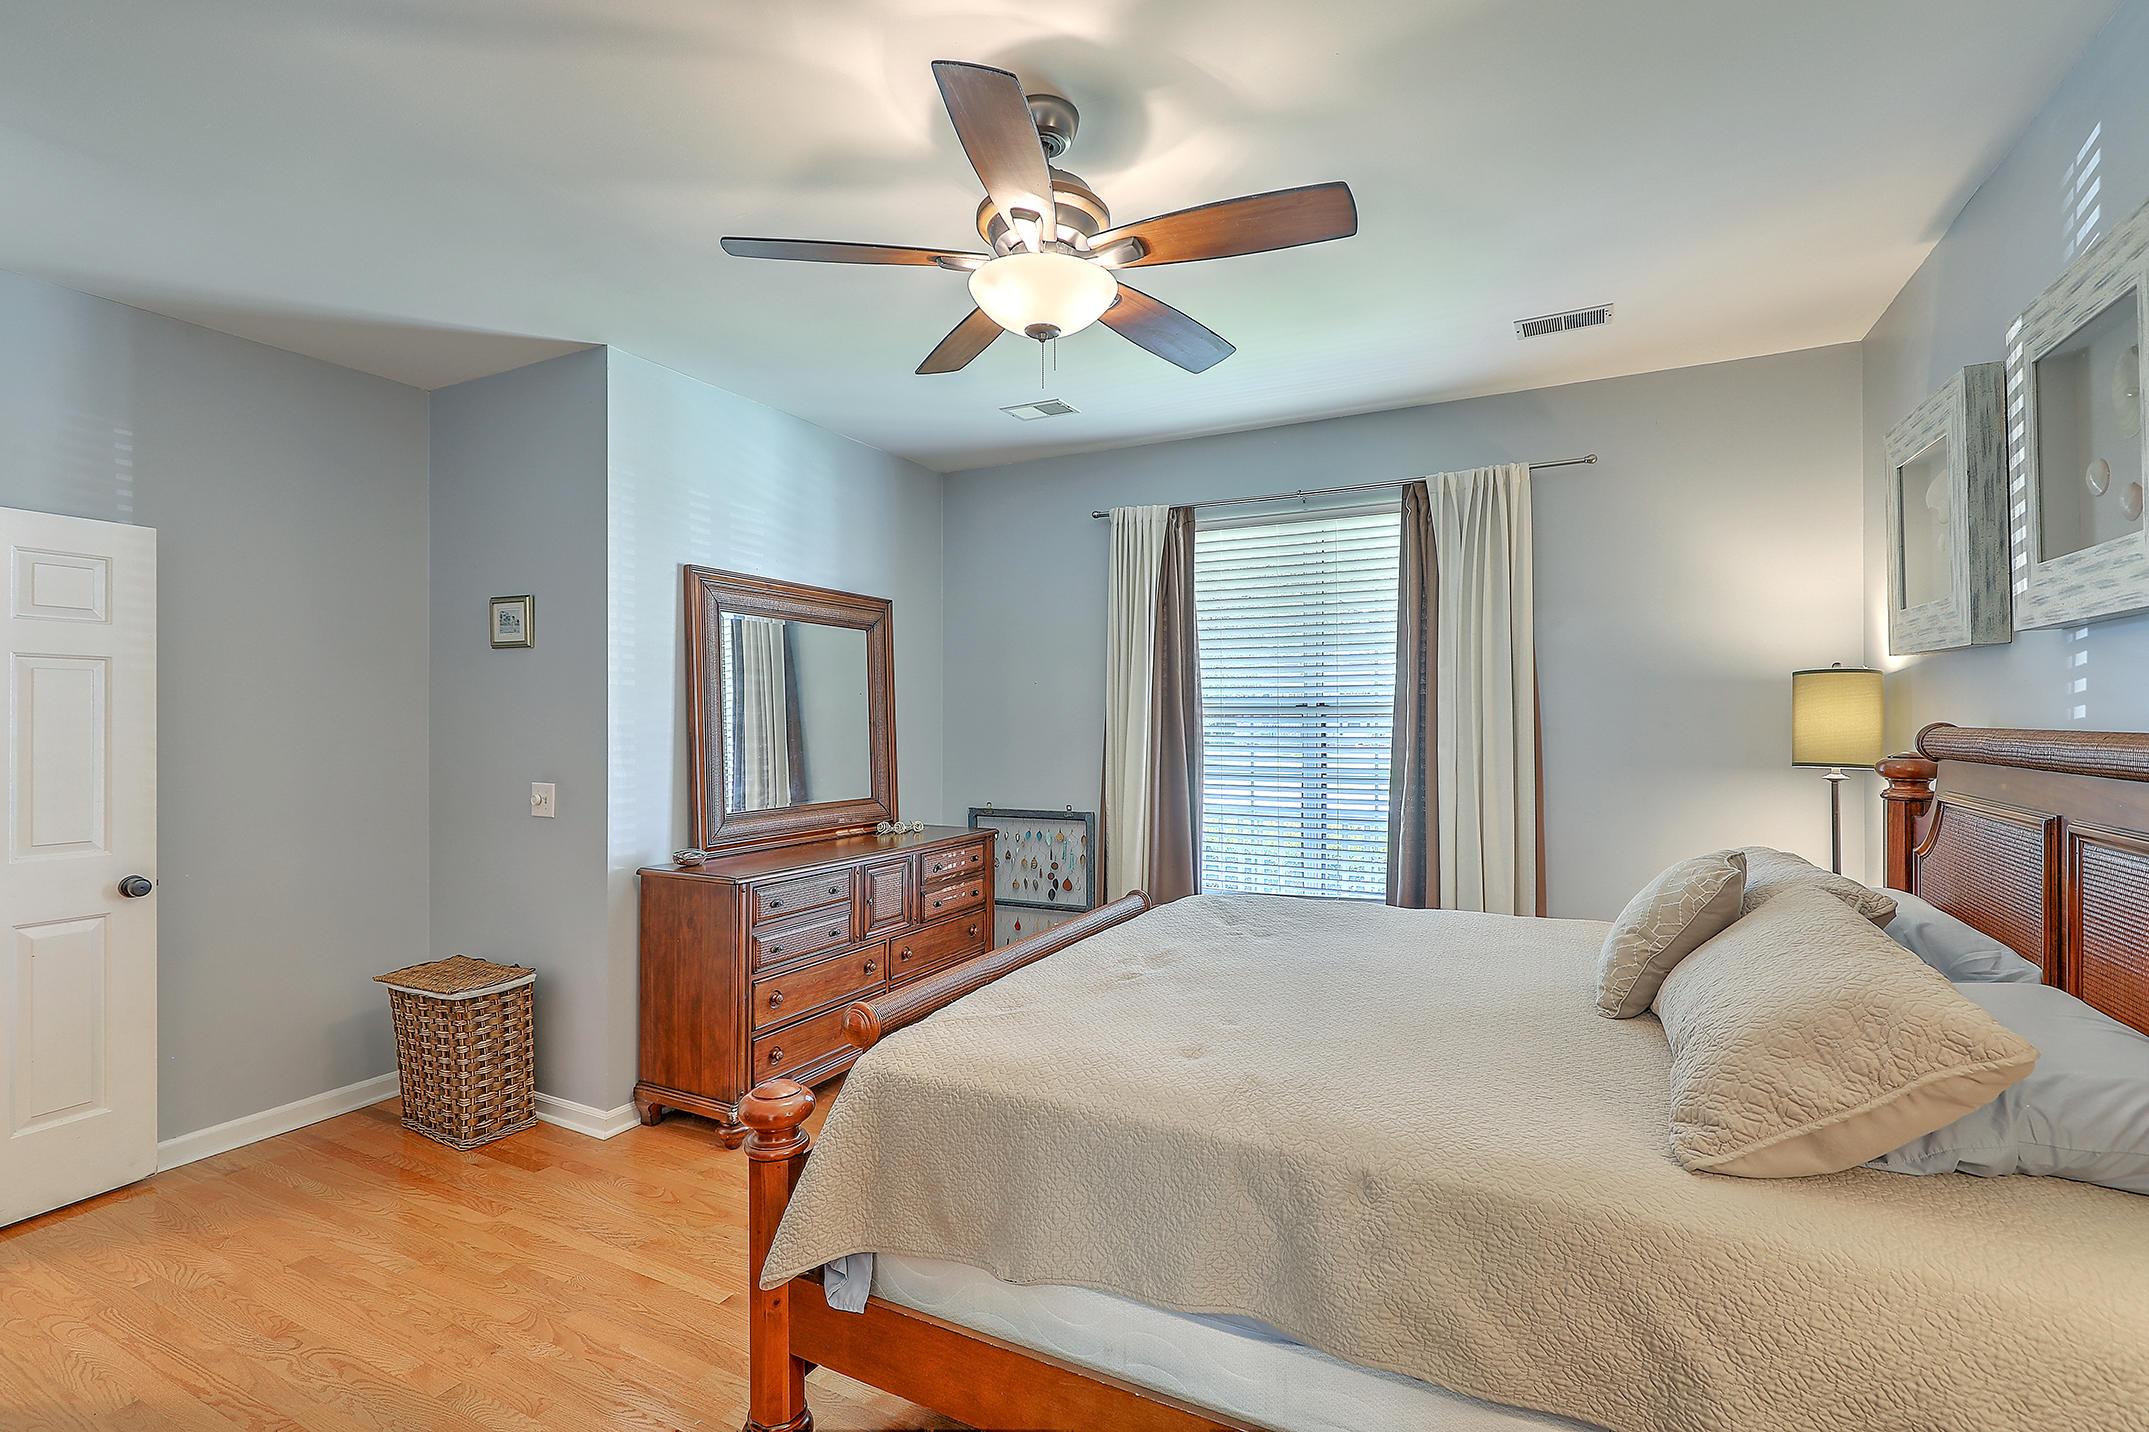 Brickyard Plantation Homes For Sale - 2720 Merwether, Mount Pleasant, SC - 8